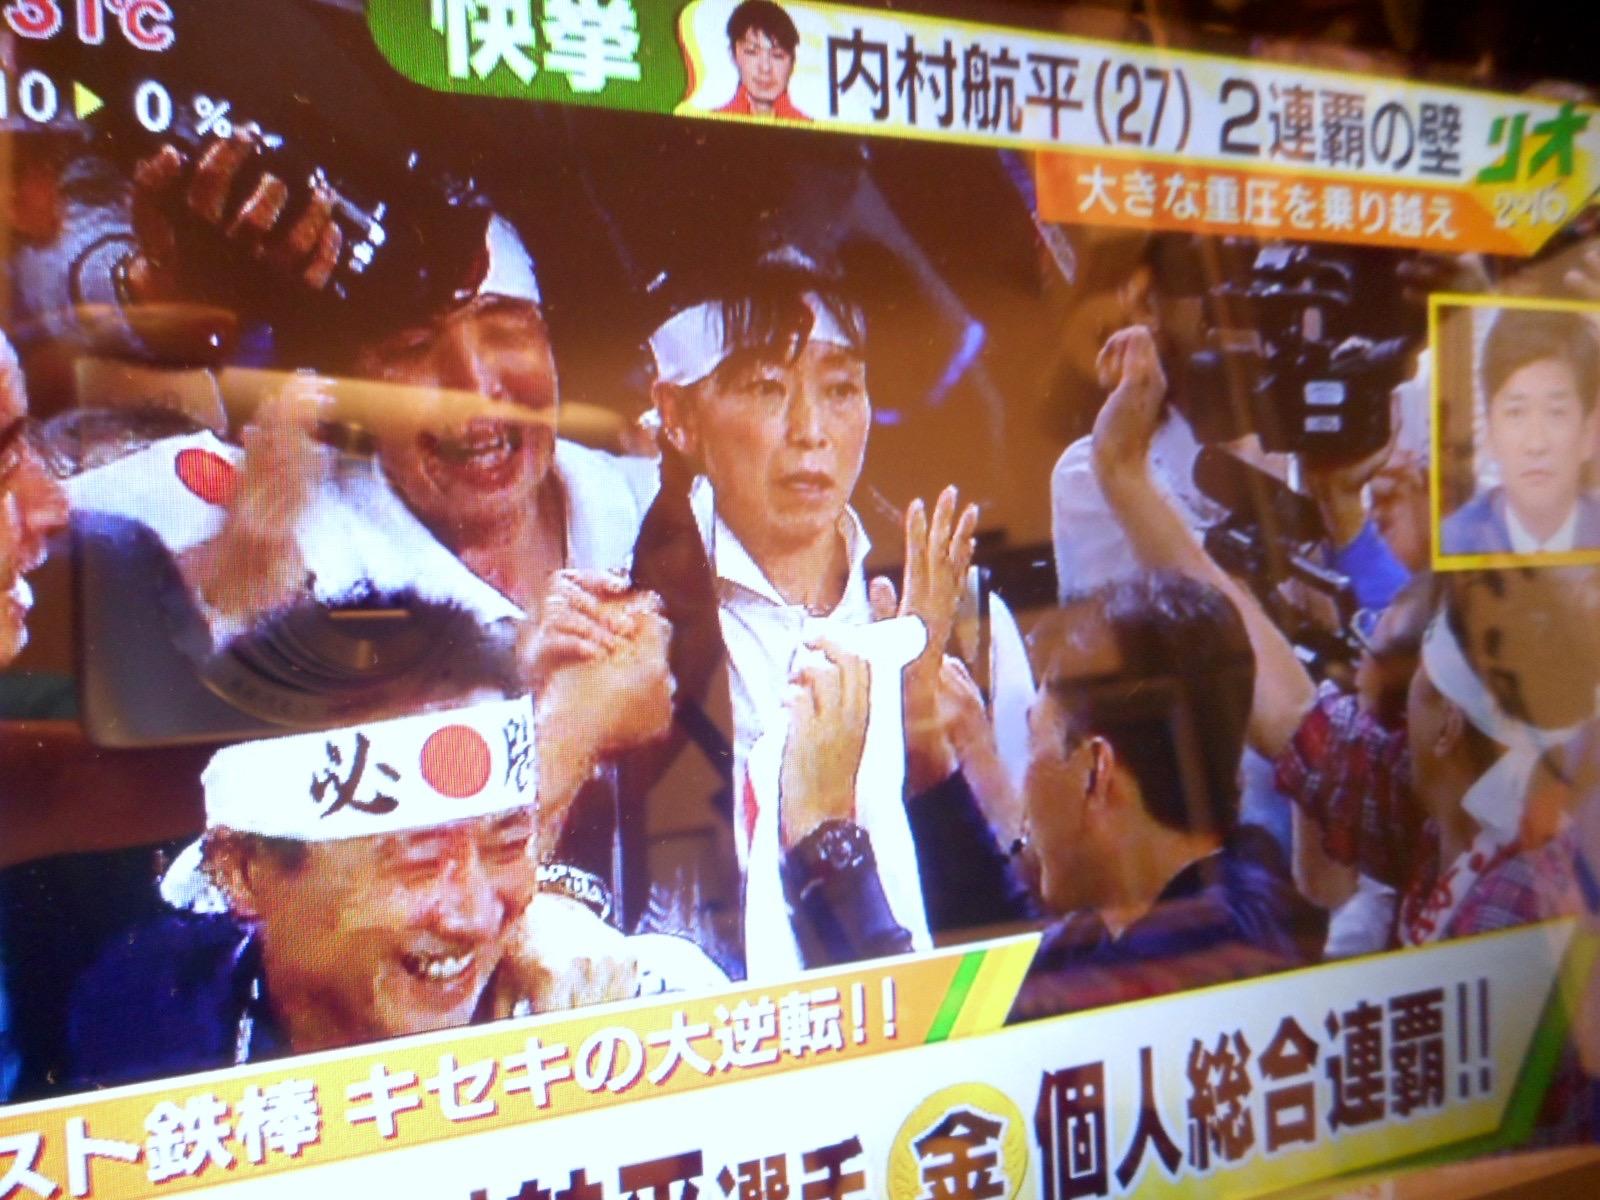 hirotogawa_jundai27by5.jpg